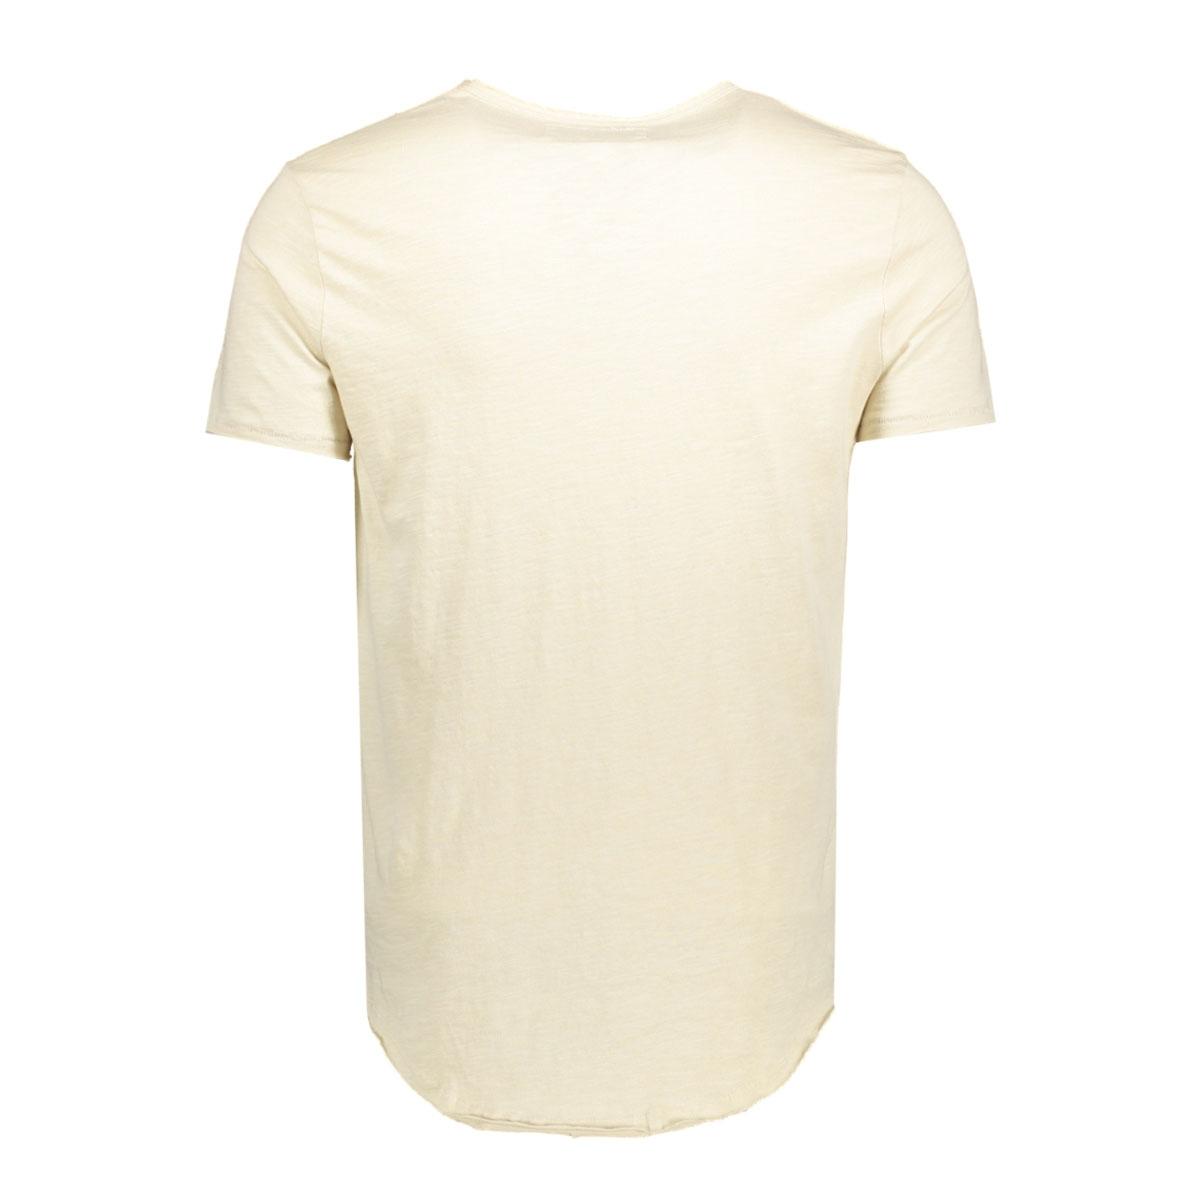 h71204 garcia t-shirt 2293 bone